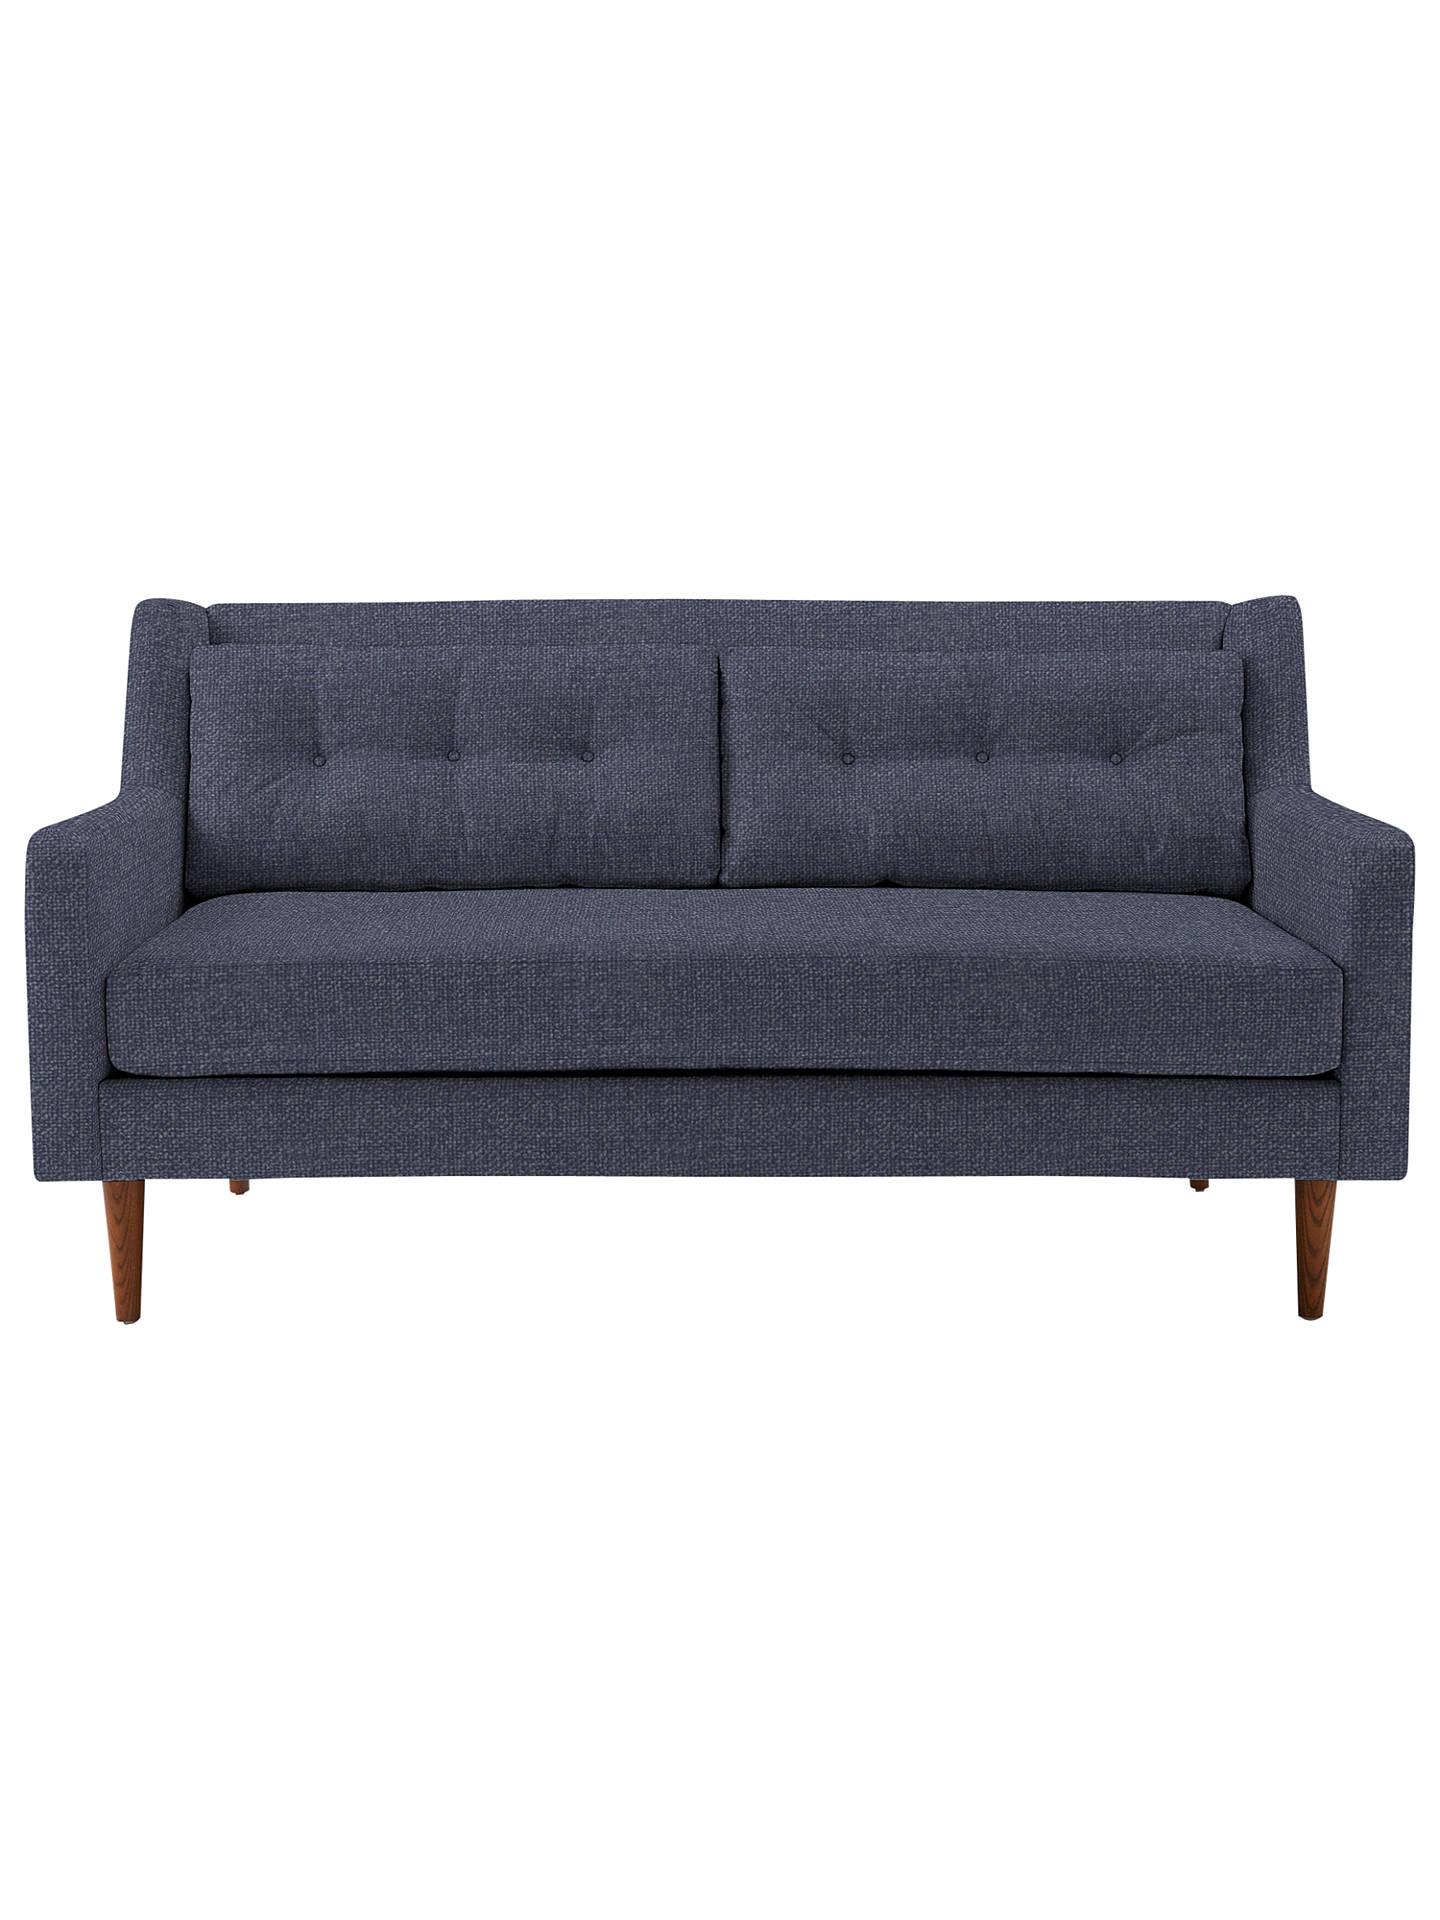 West Elm Crosby 2 Seater Sofa Aegean Blue At John Lewis